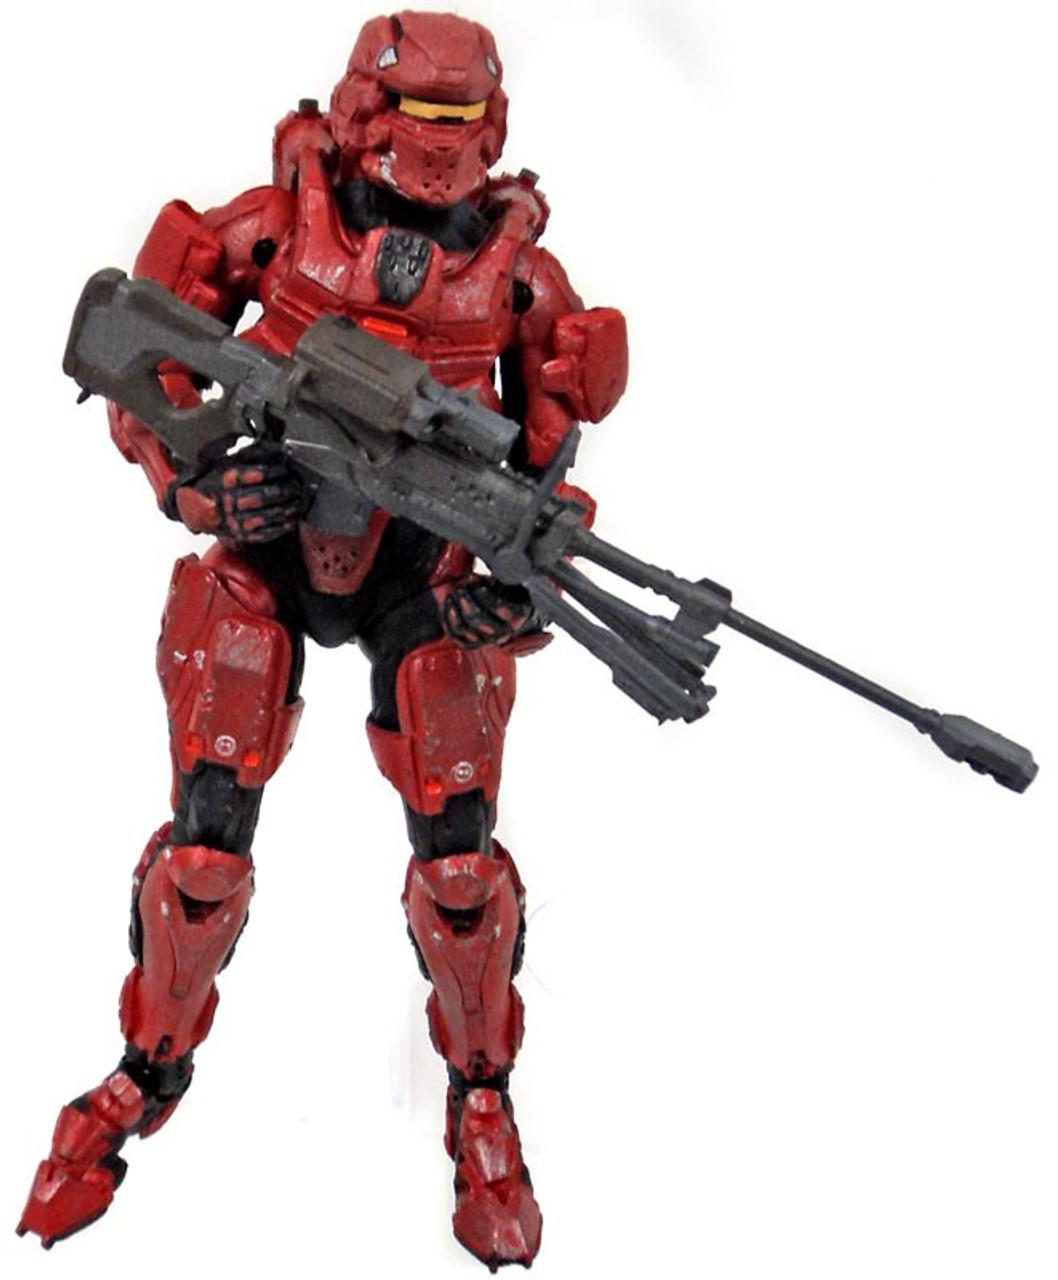 McFarlane Toys Halo 4 Series 1-CRAWLER Action Figure